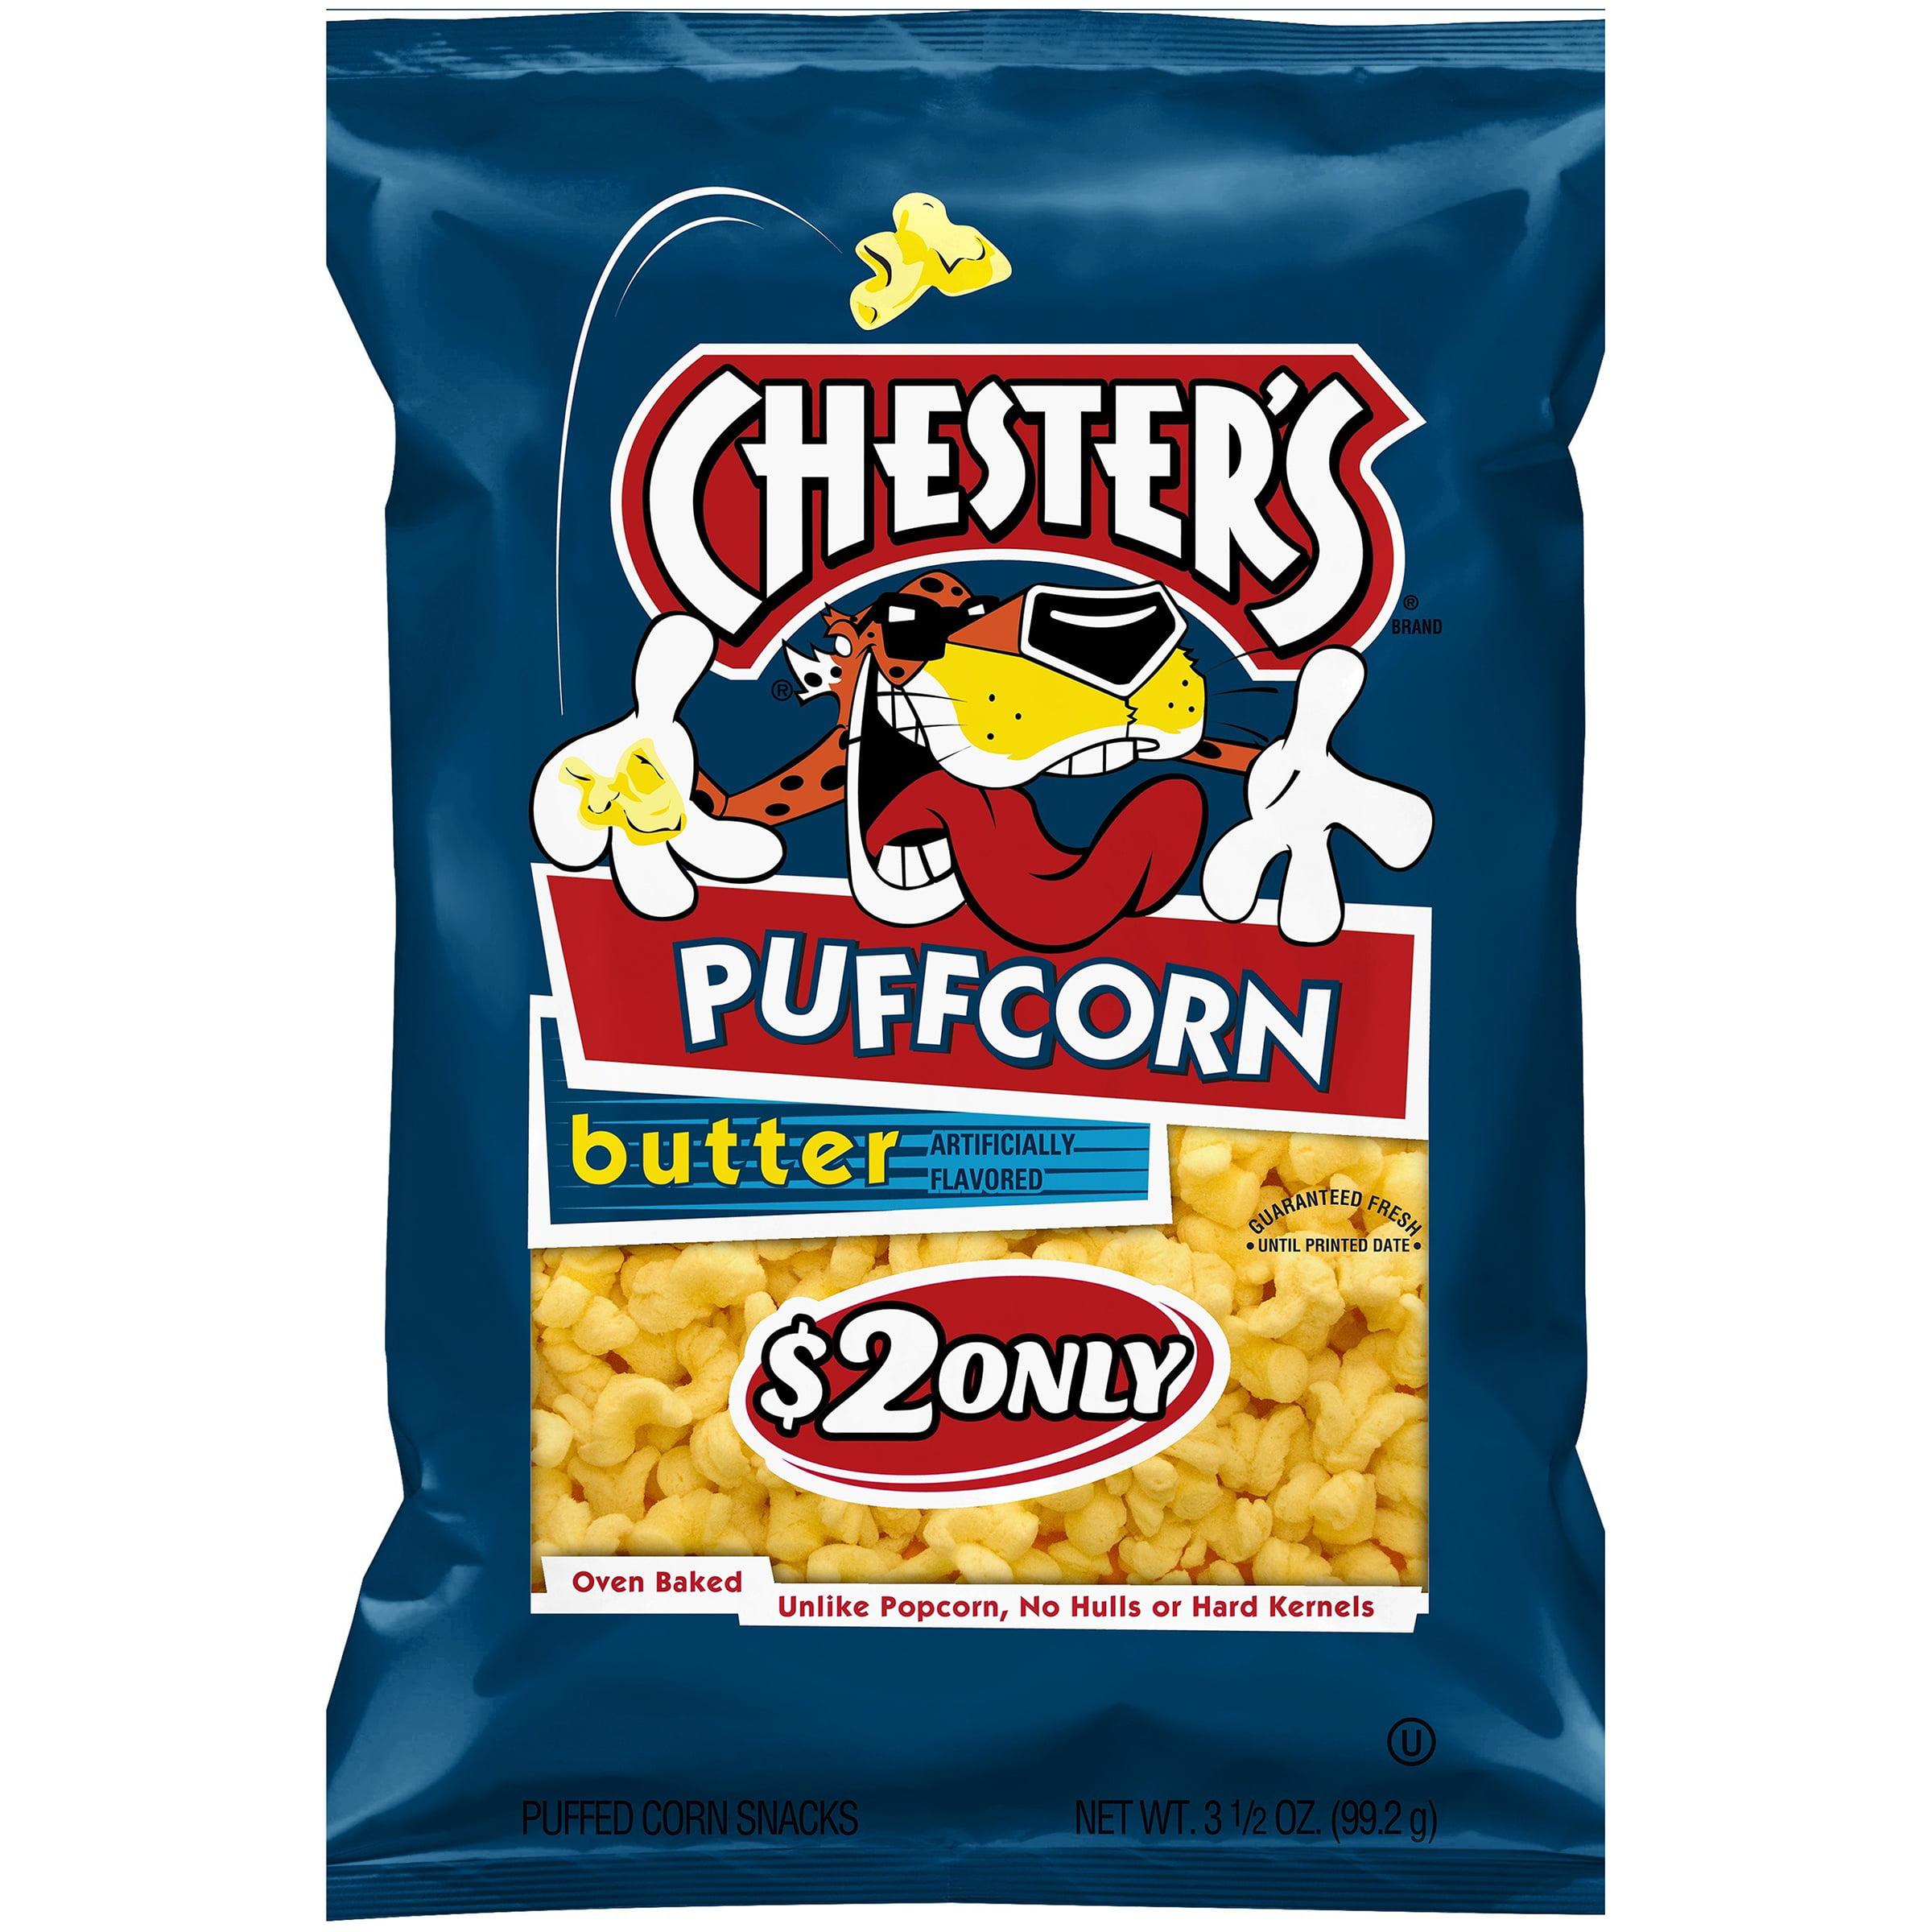 Chester's PuffCorn Butter Puffed Corn Snacks, 3.5 oz Bag